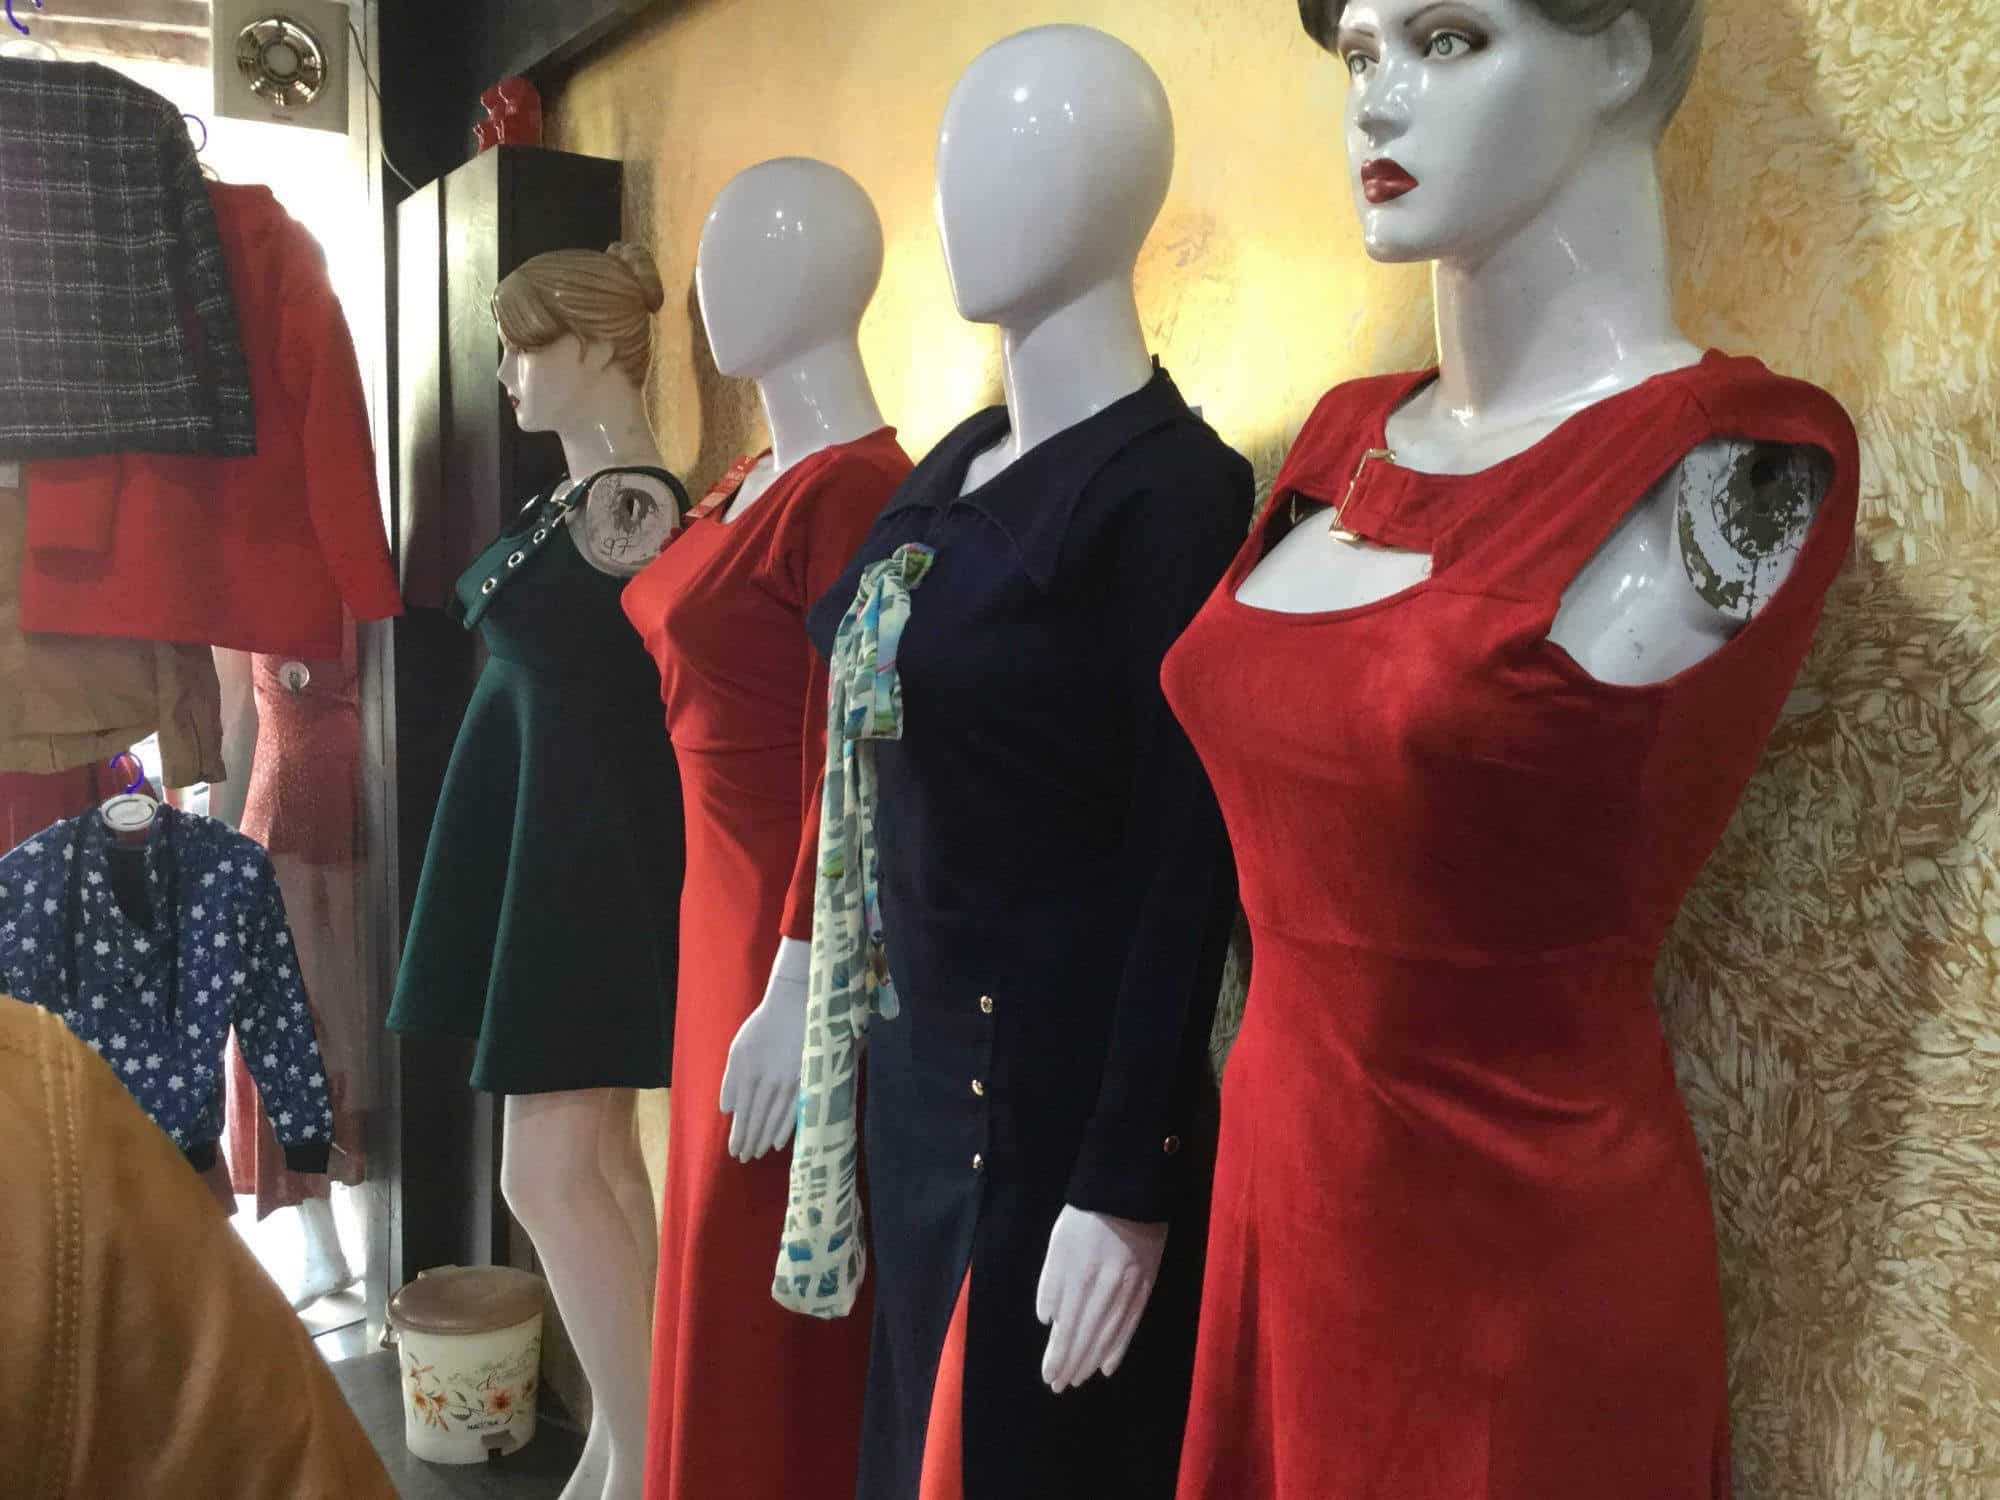 fb2f02b644 Sagars Fashion Hub, Jawahar Nagar - Readymade Garment Retailers in Ludhiana  - Justdial